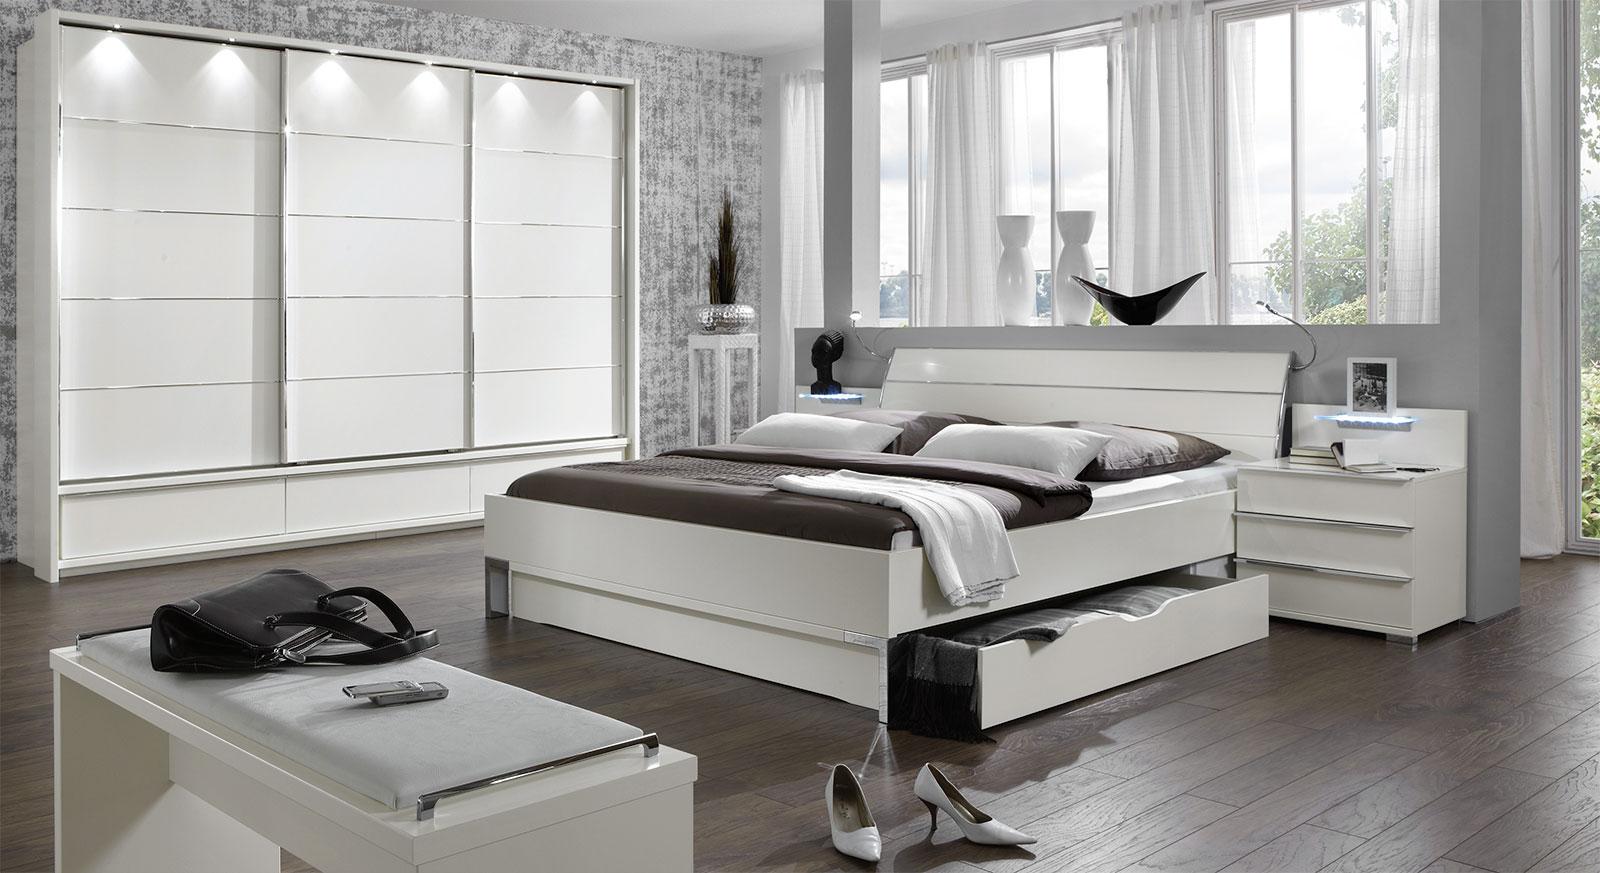 Holz Bett Design Google Search Bedroom Pinterest Bett Klassische ...